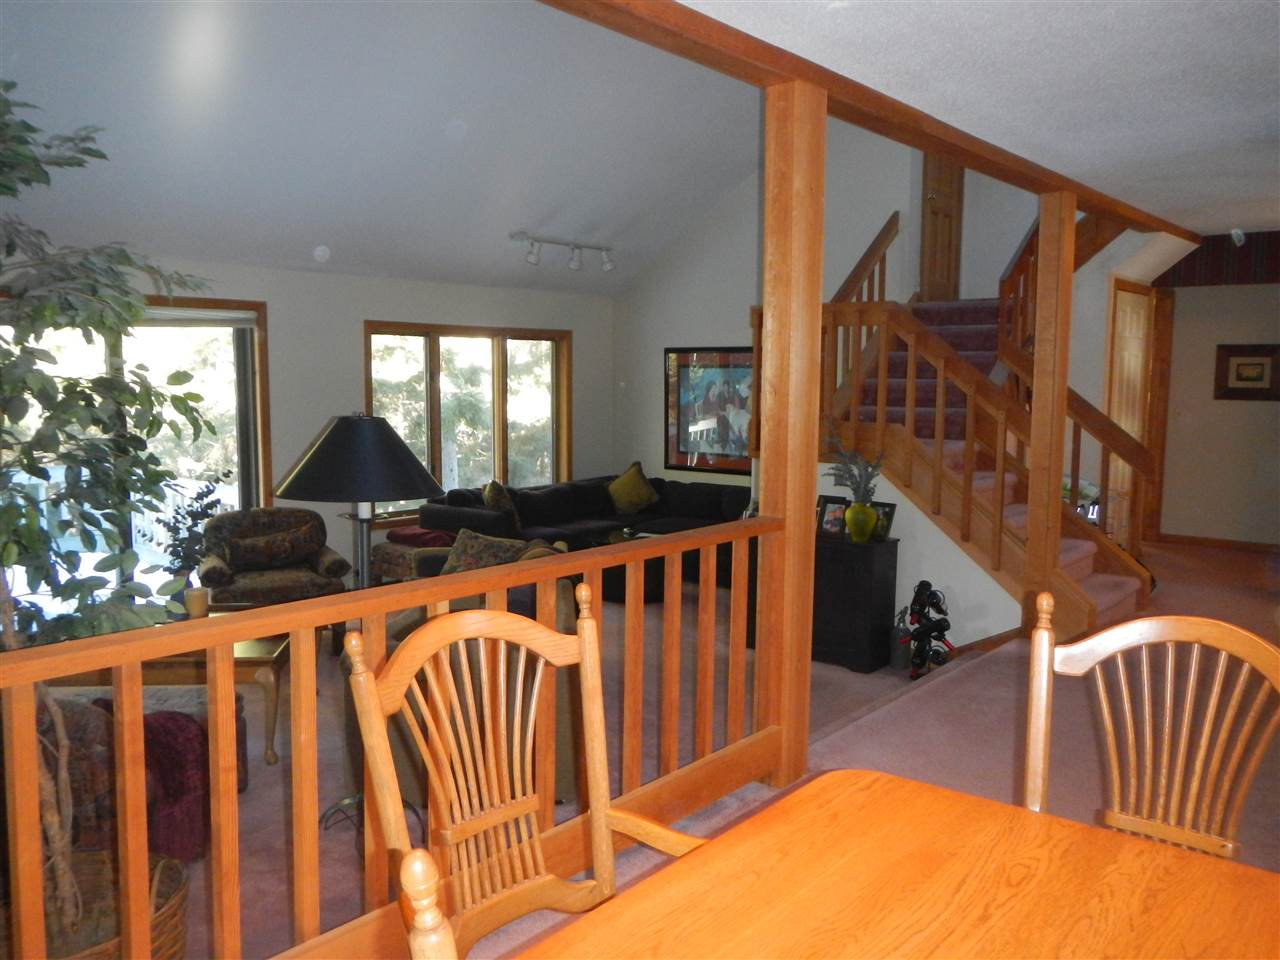 Mount-Snow-Real-Estate-4614310-6